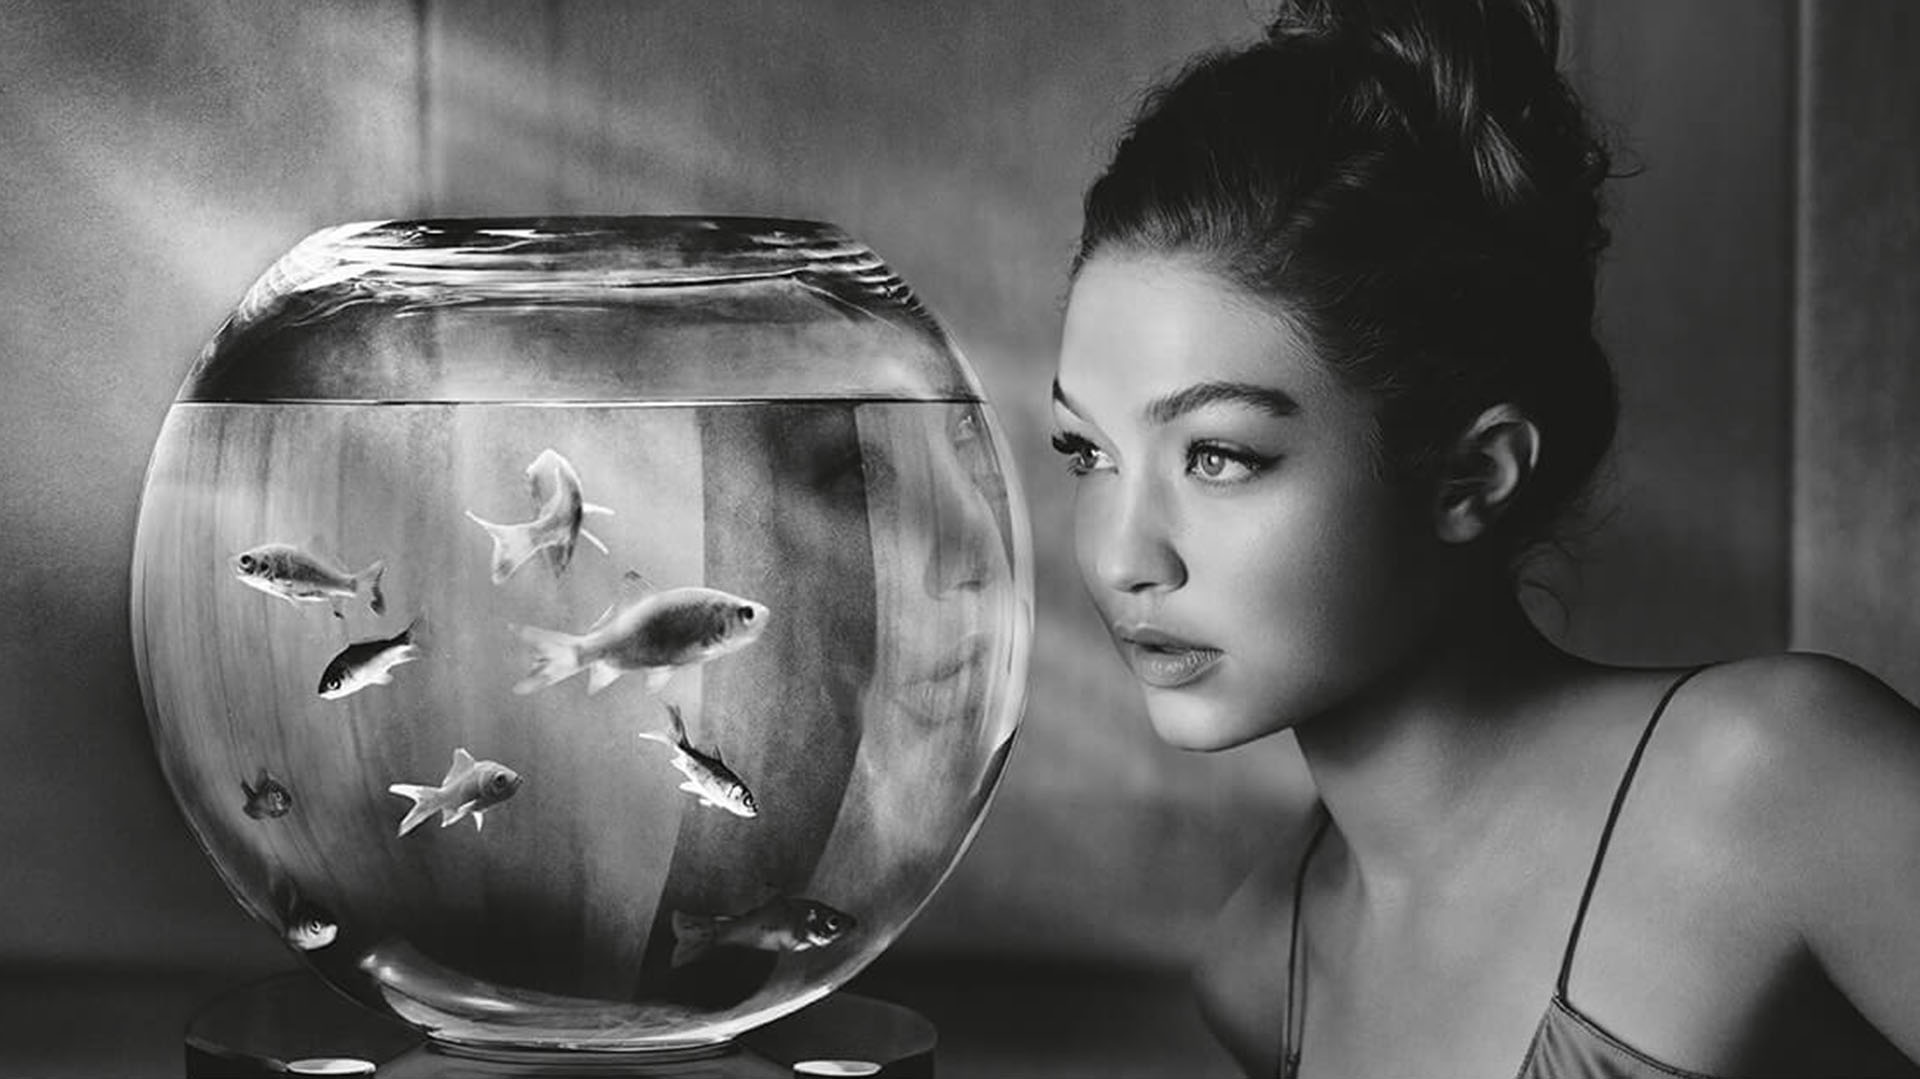 La modelo del momento Gigi Hadid, fotografiada en blanco y negro por Albert Watson